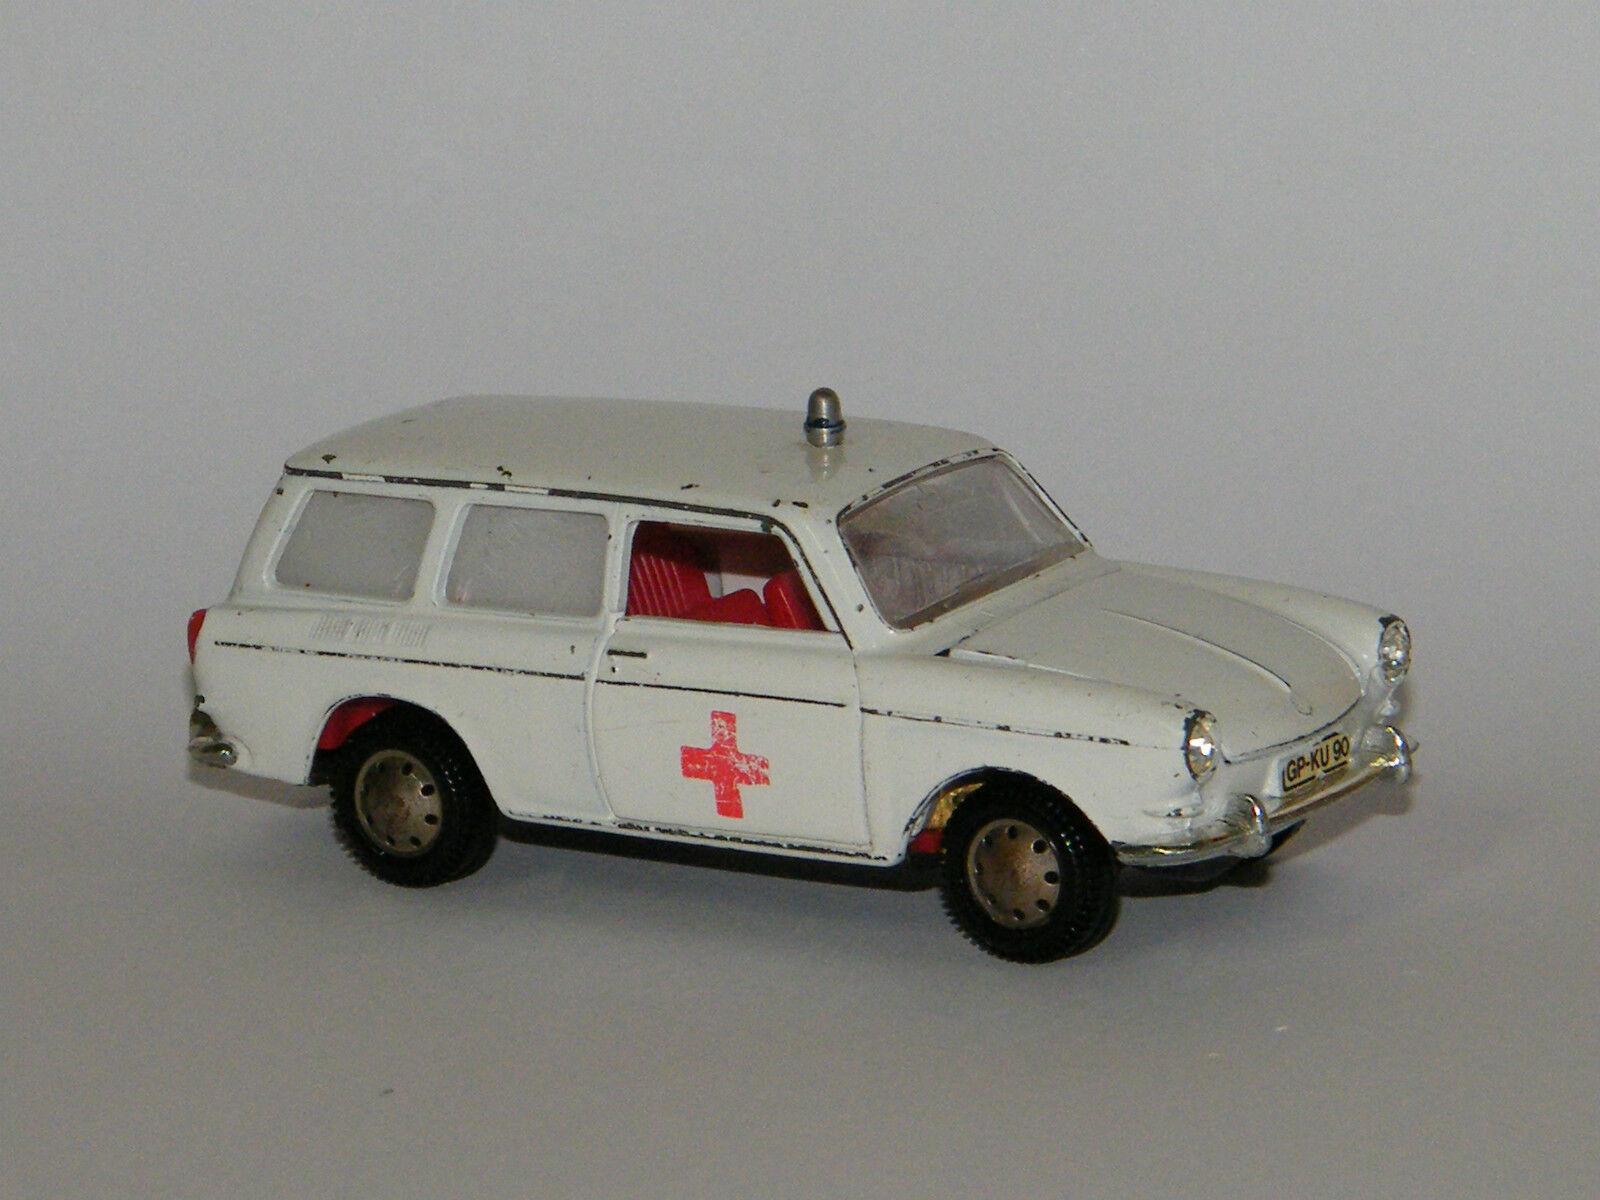 Märklin vw variant 1600 L, mmodellauto  ambulance voiture, ambulance, 1 43  meilleur service